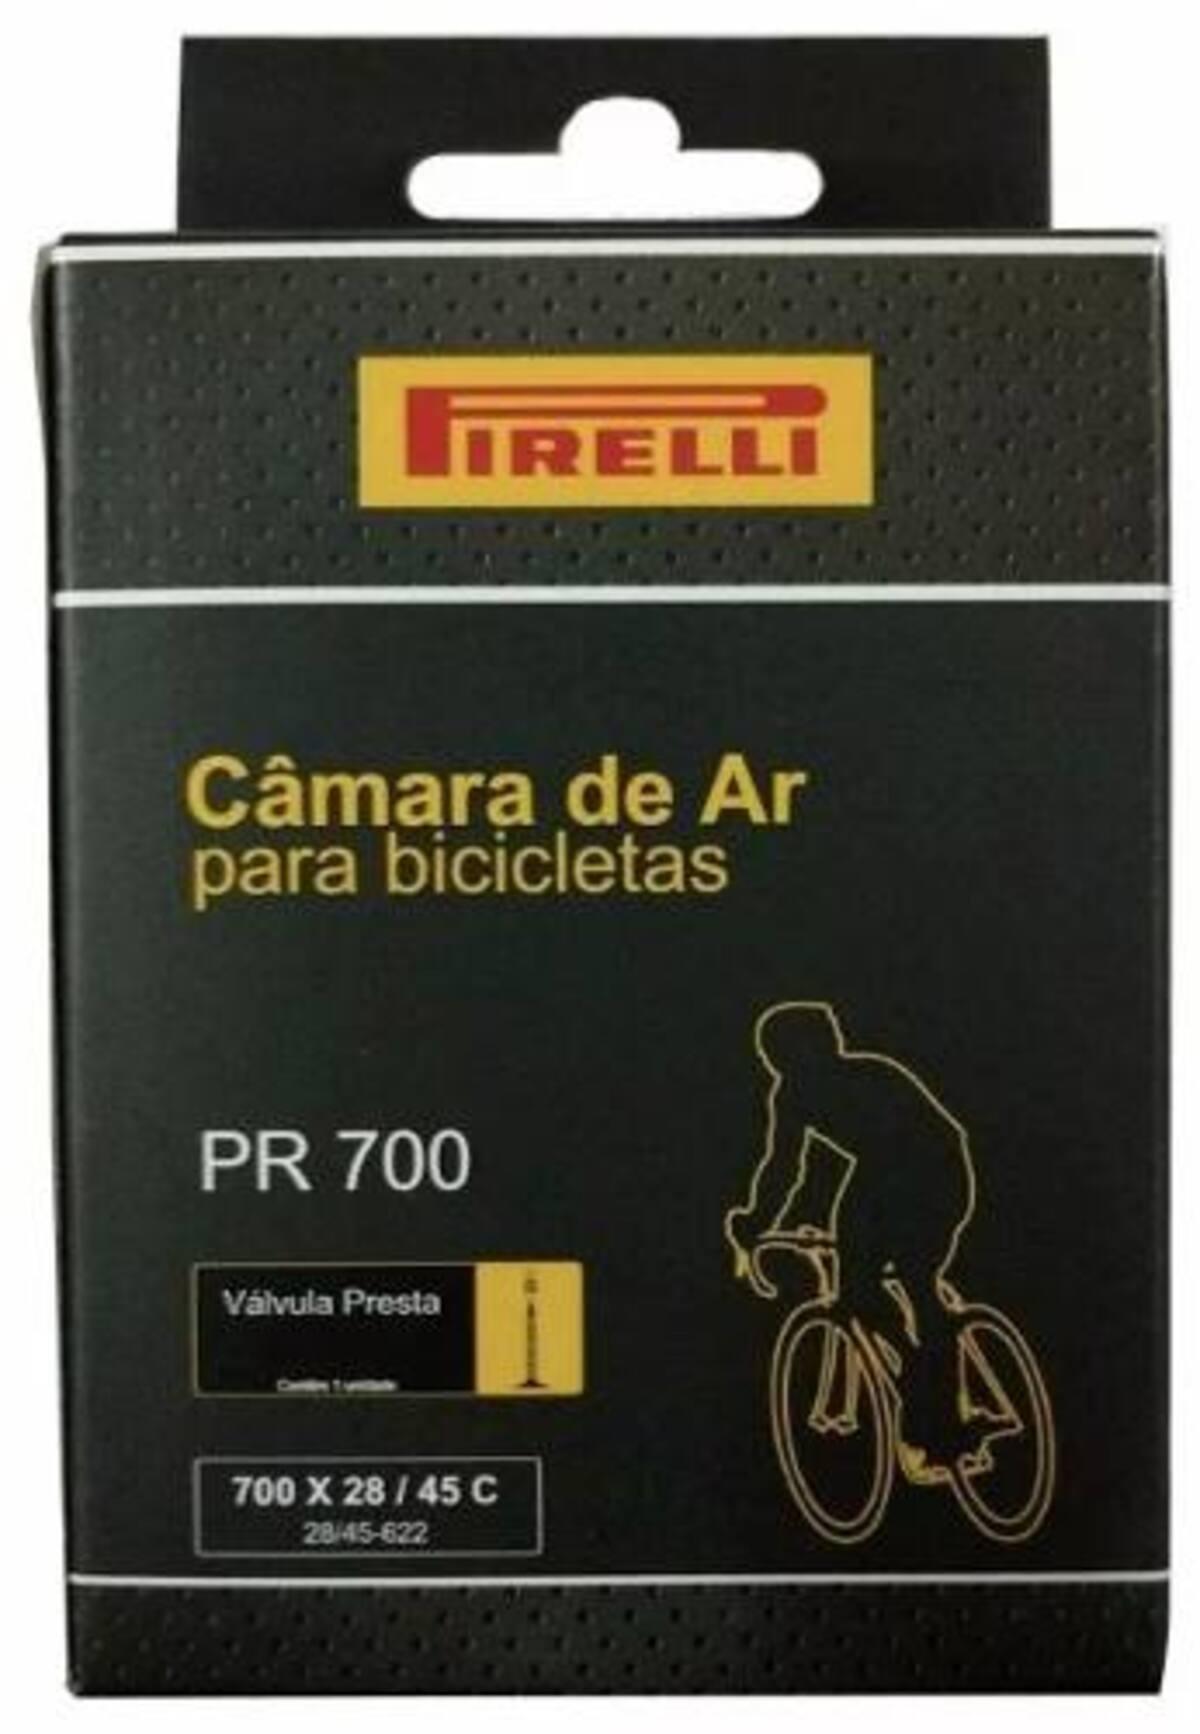 Kit Pneu 700x25 Power Endurance Michelin e Câmara Pirelli 700